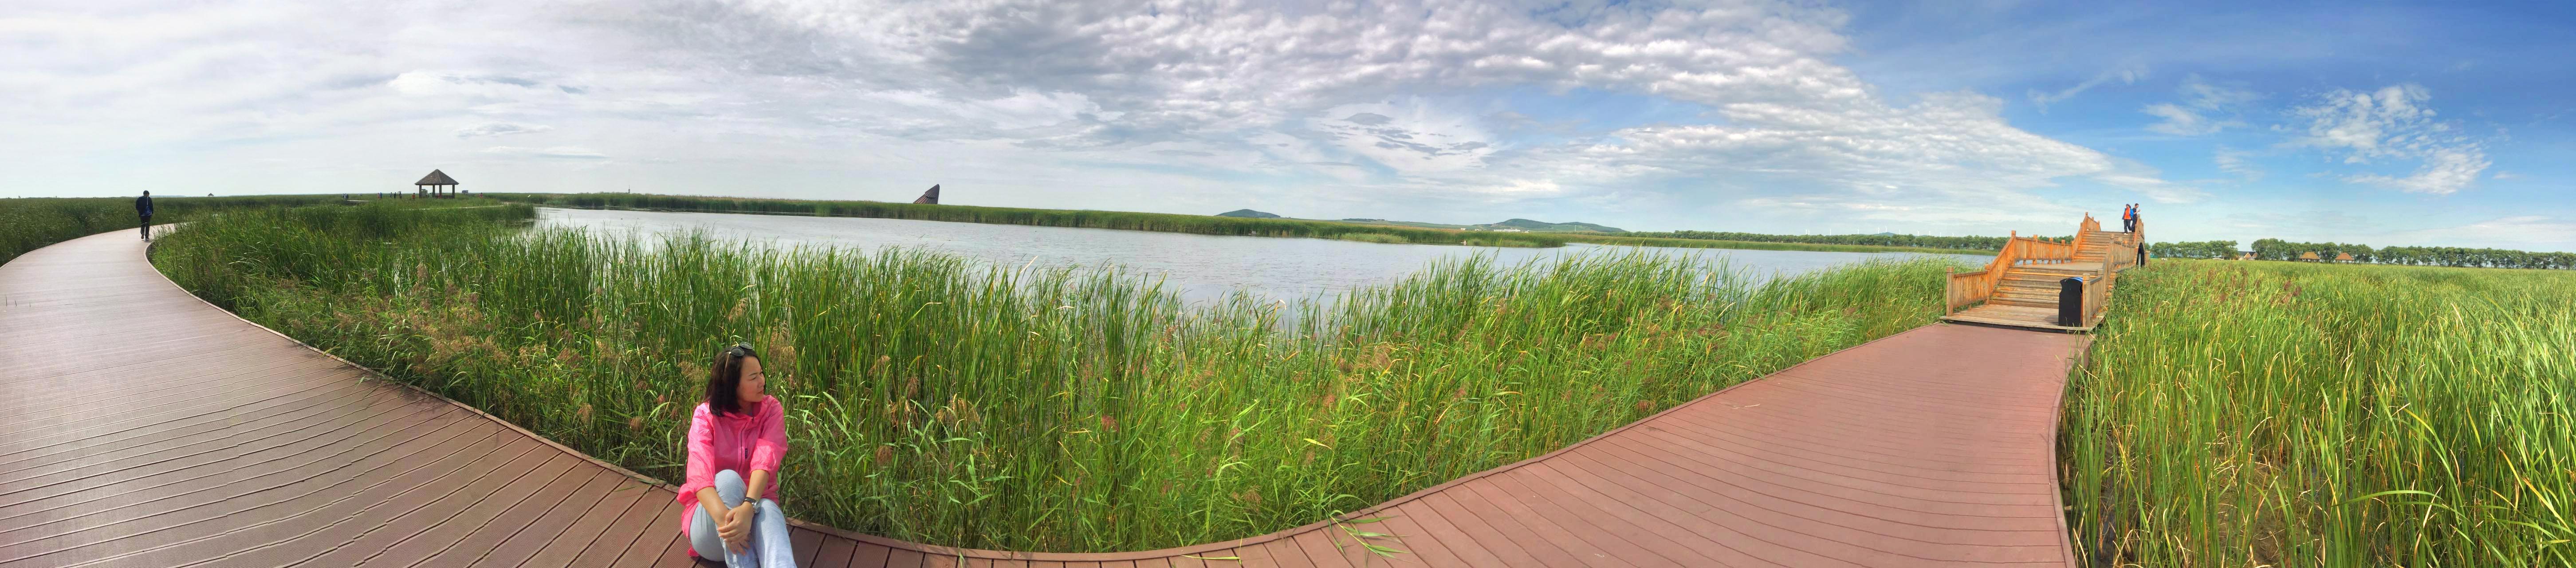 Fujin National Wetland